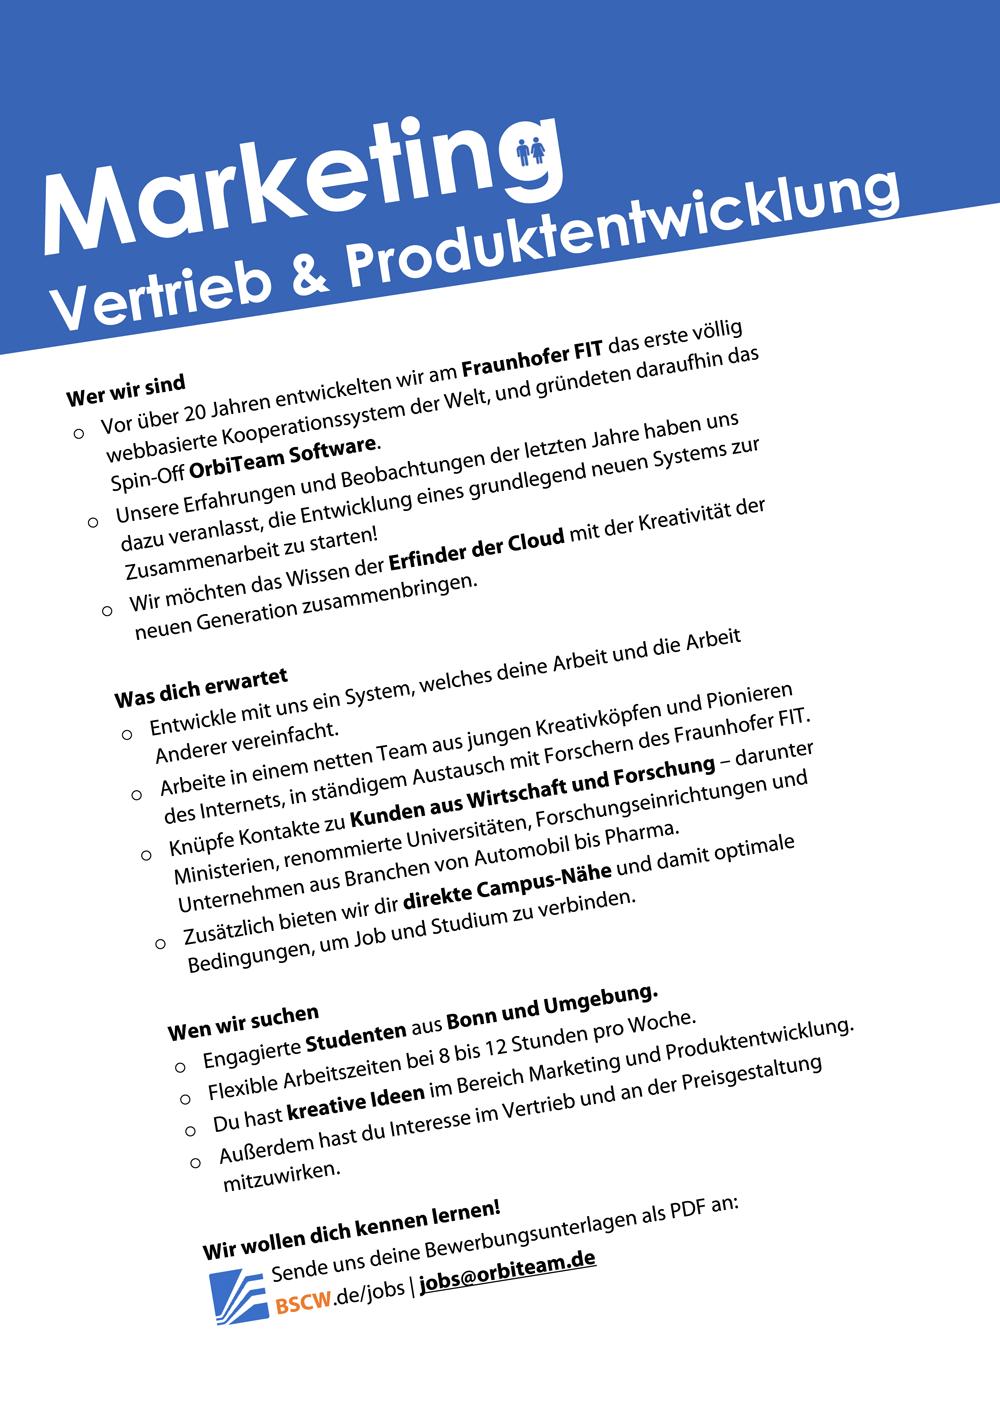 job_marketing.png